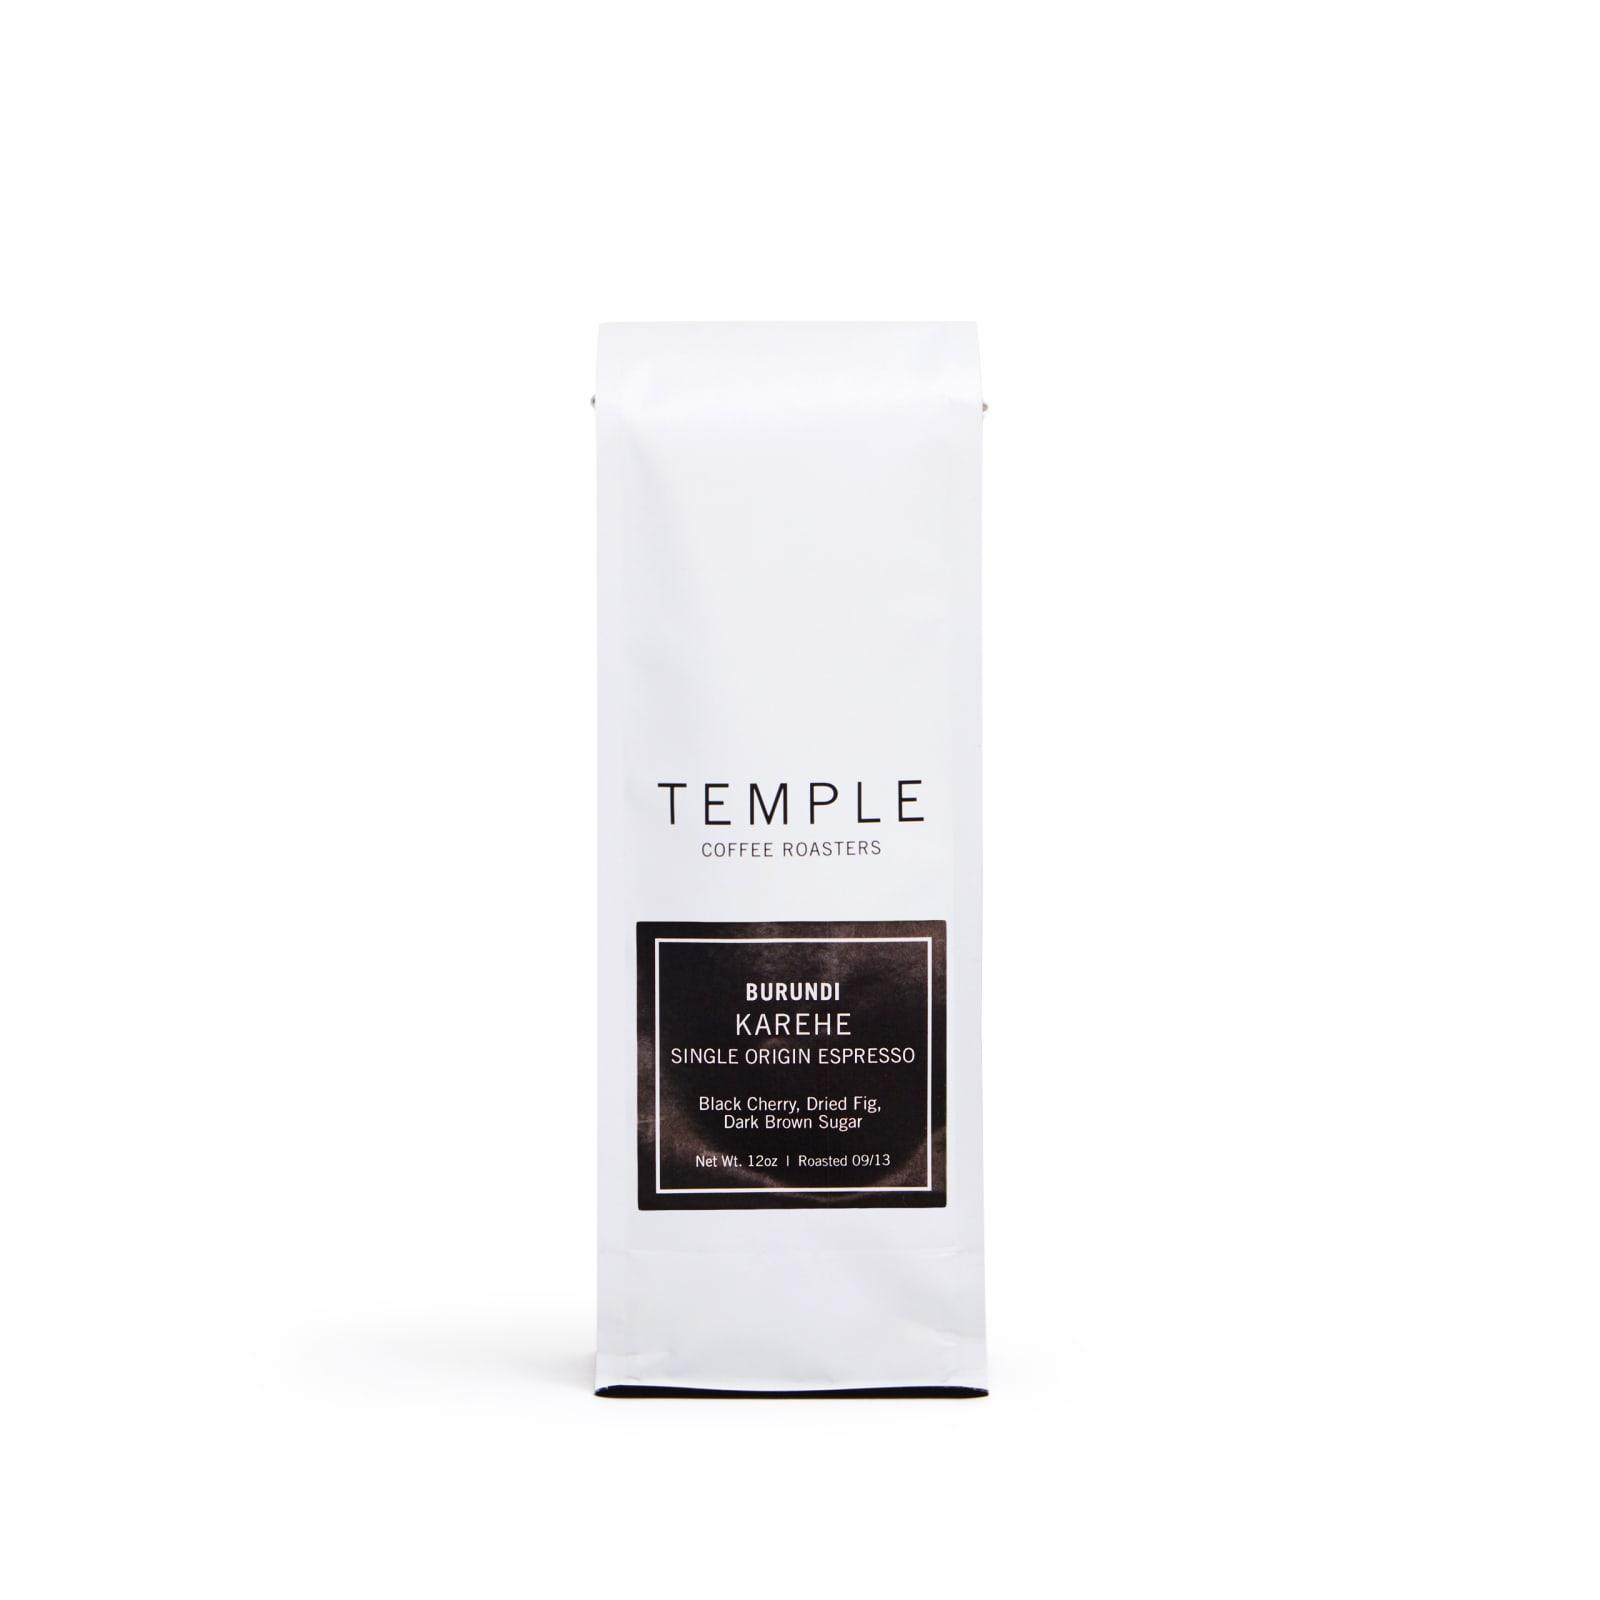 Burundi Karehe Single Origin Espresso